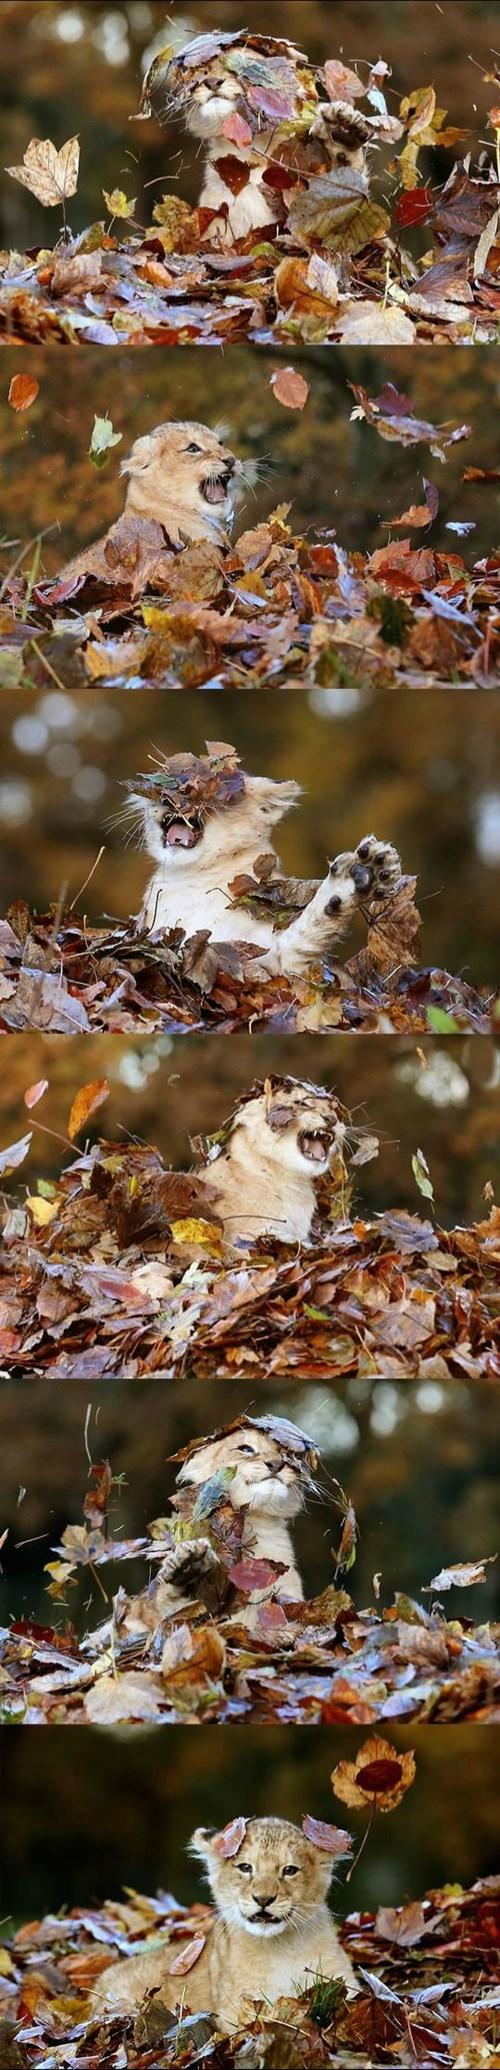 cub lion leaves Cats - 8398569728